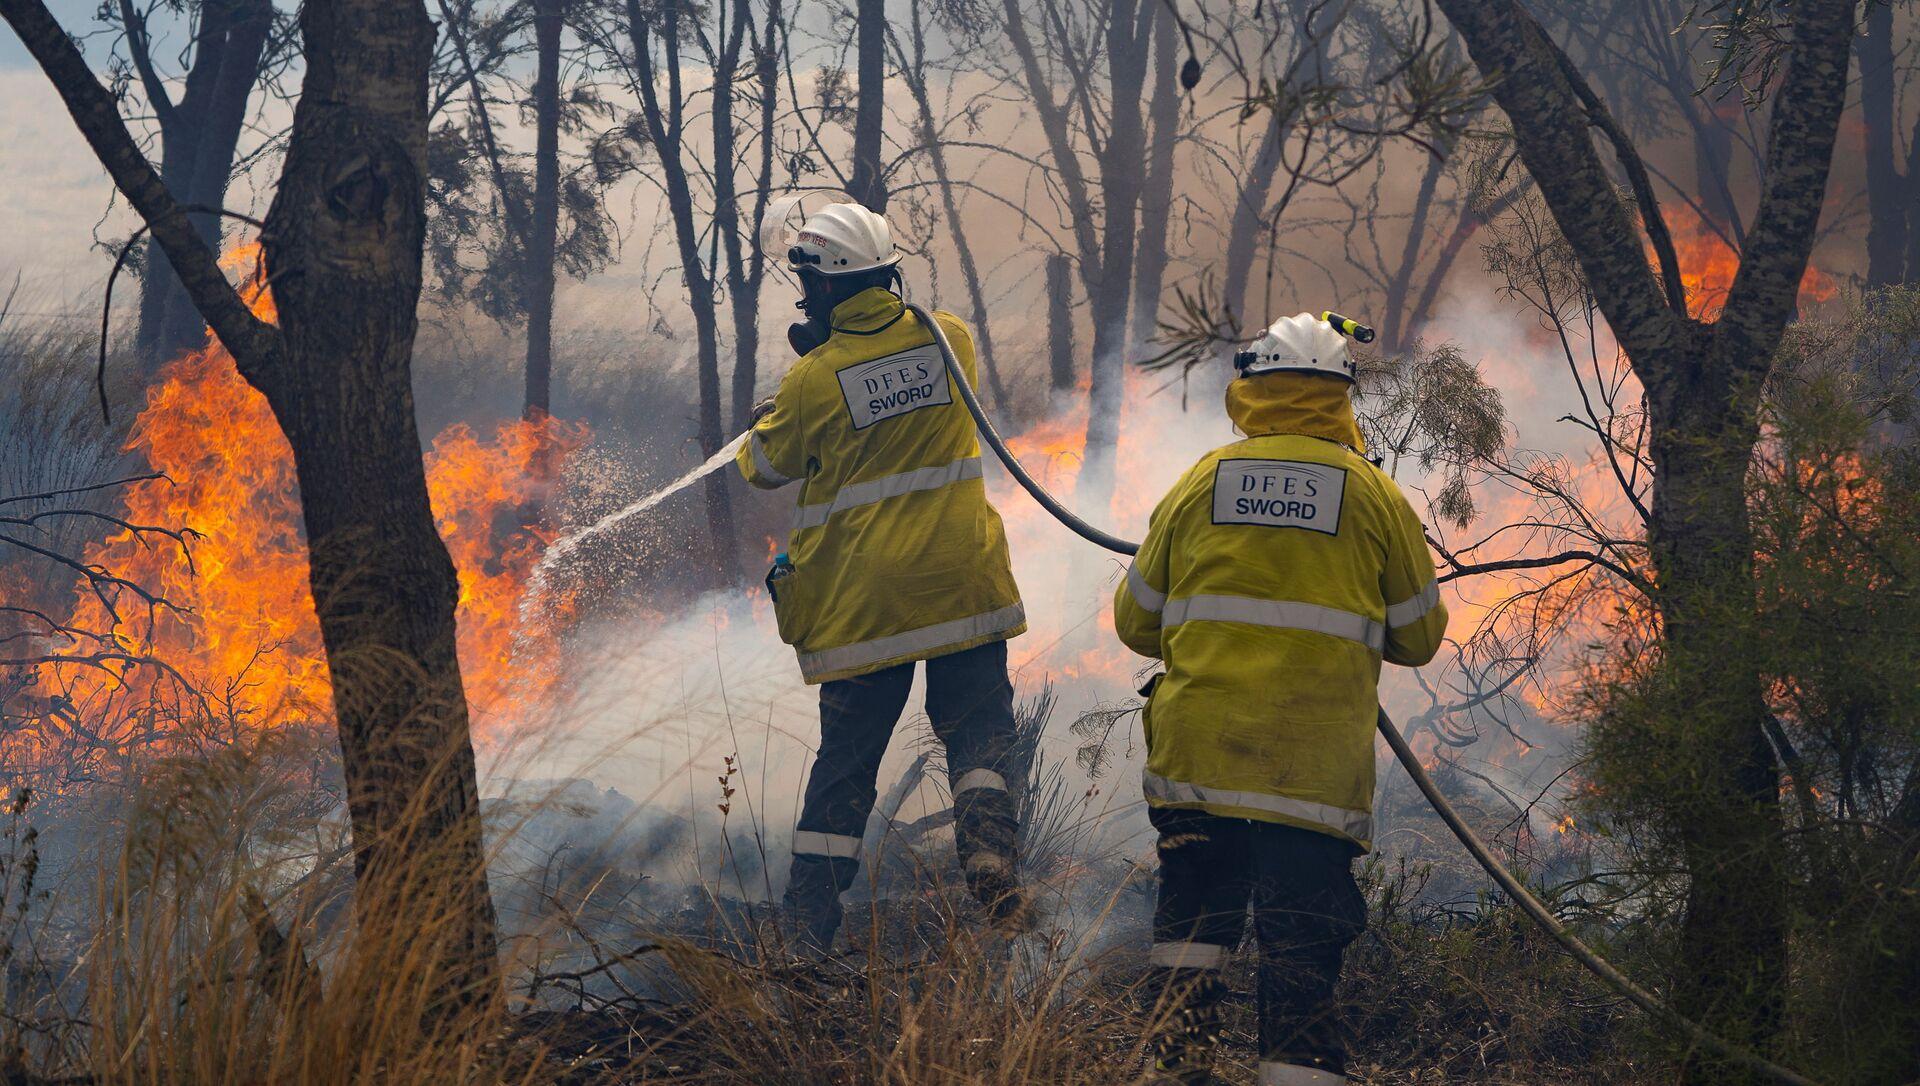 Un incendio forestal en Australia - Sputnik Mundo, 1920, 02.02.2021